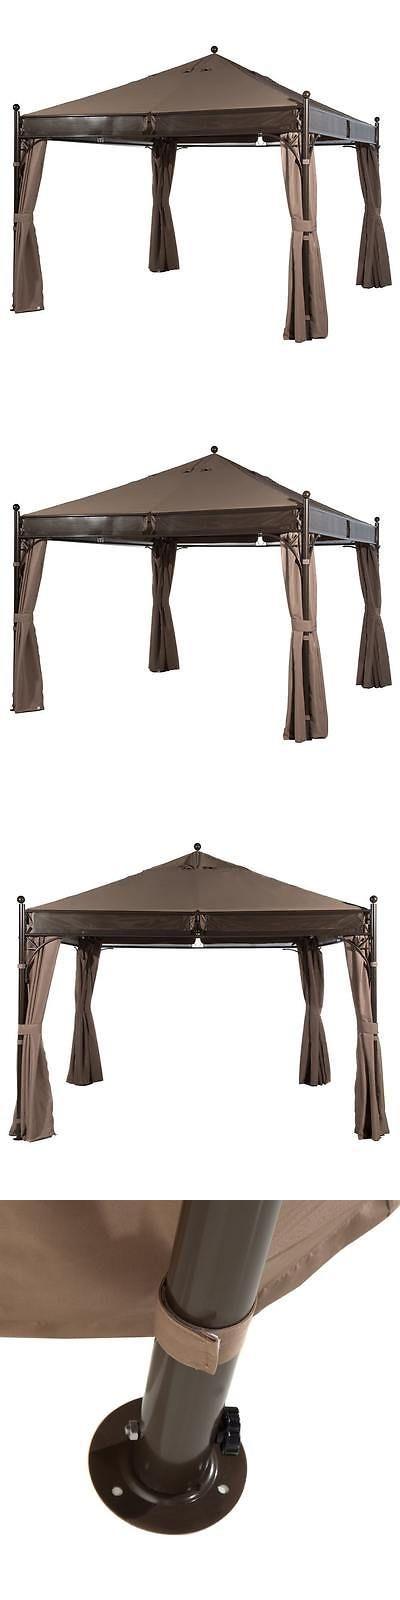 Gazebos 180995: Abba Patio 12 X 12 Ft Outdoor Art Steel Frame Garden Party Canopy Backyard -> BUY IT NOW ONLY: $699.99 on eBay!